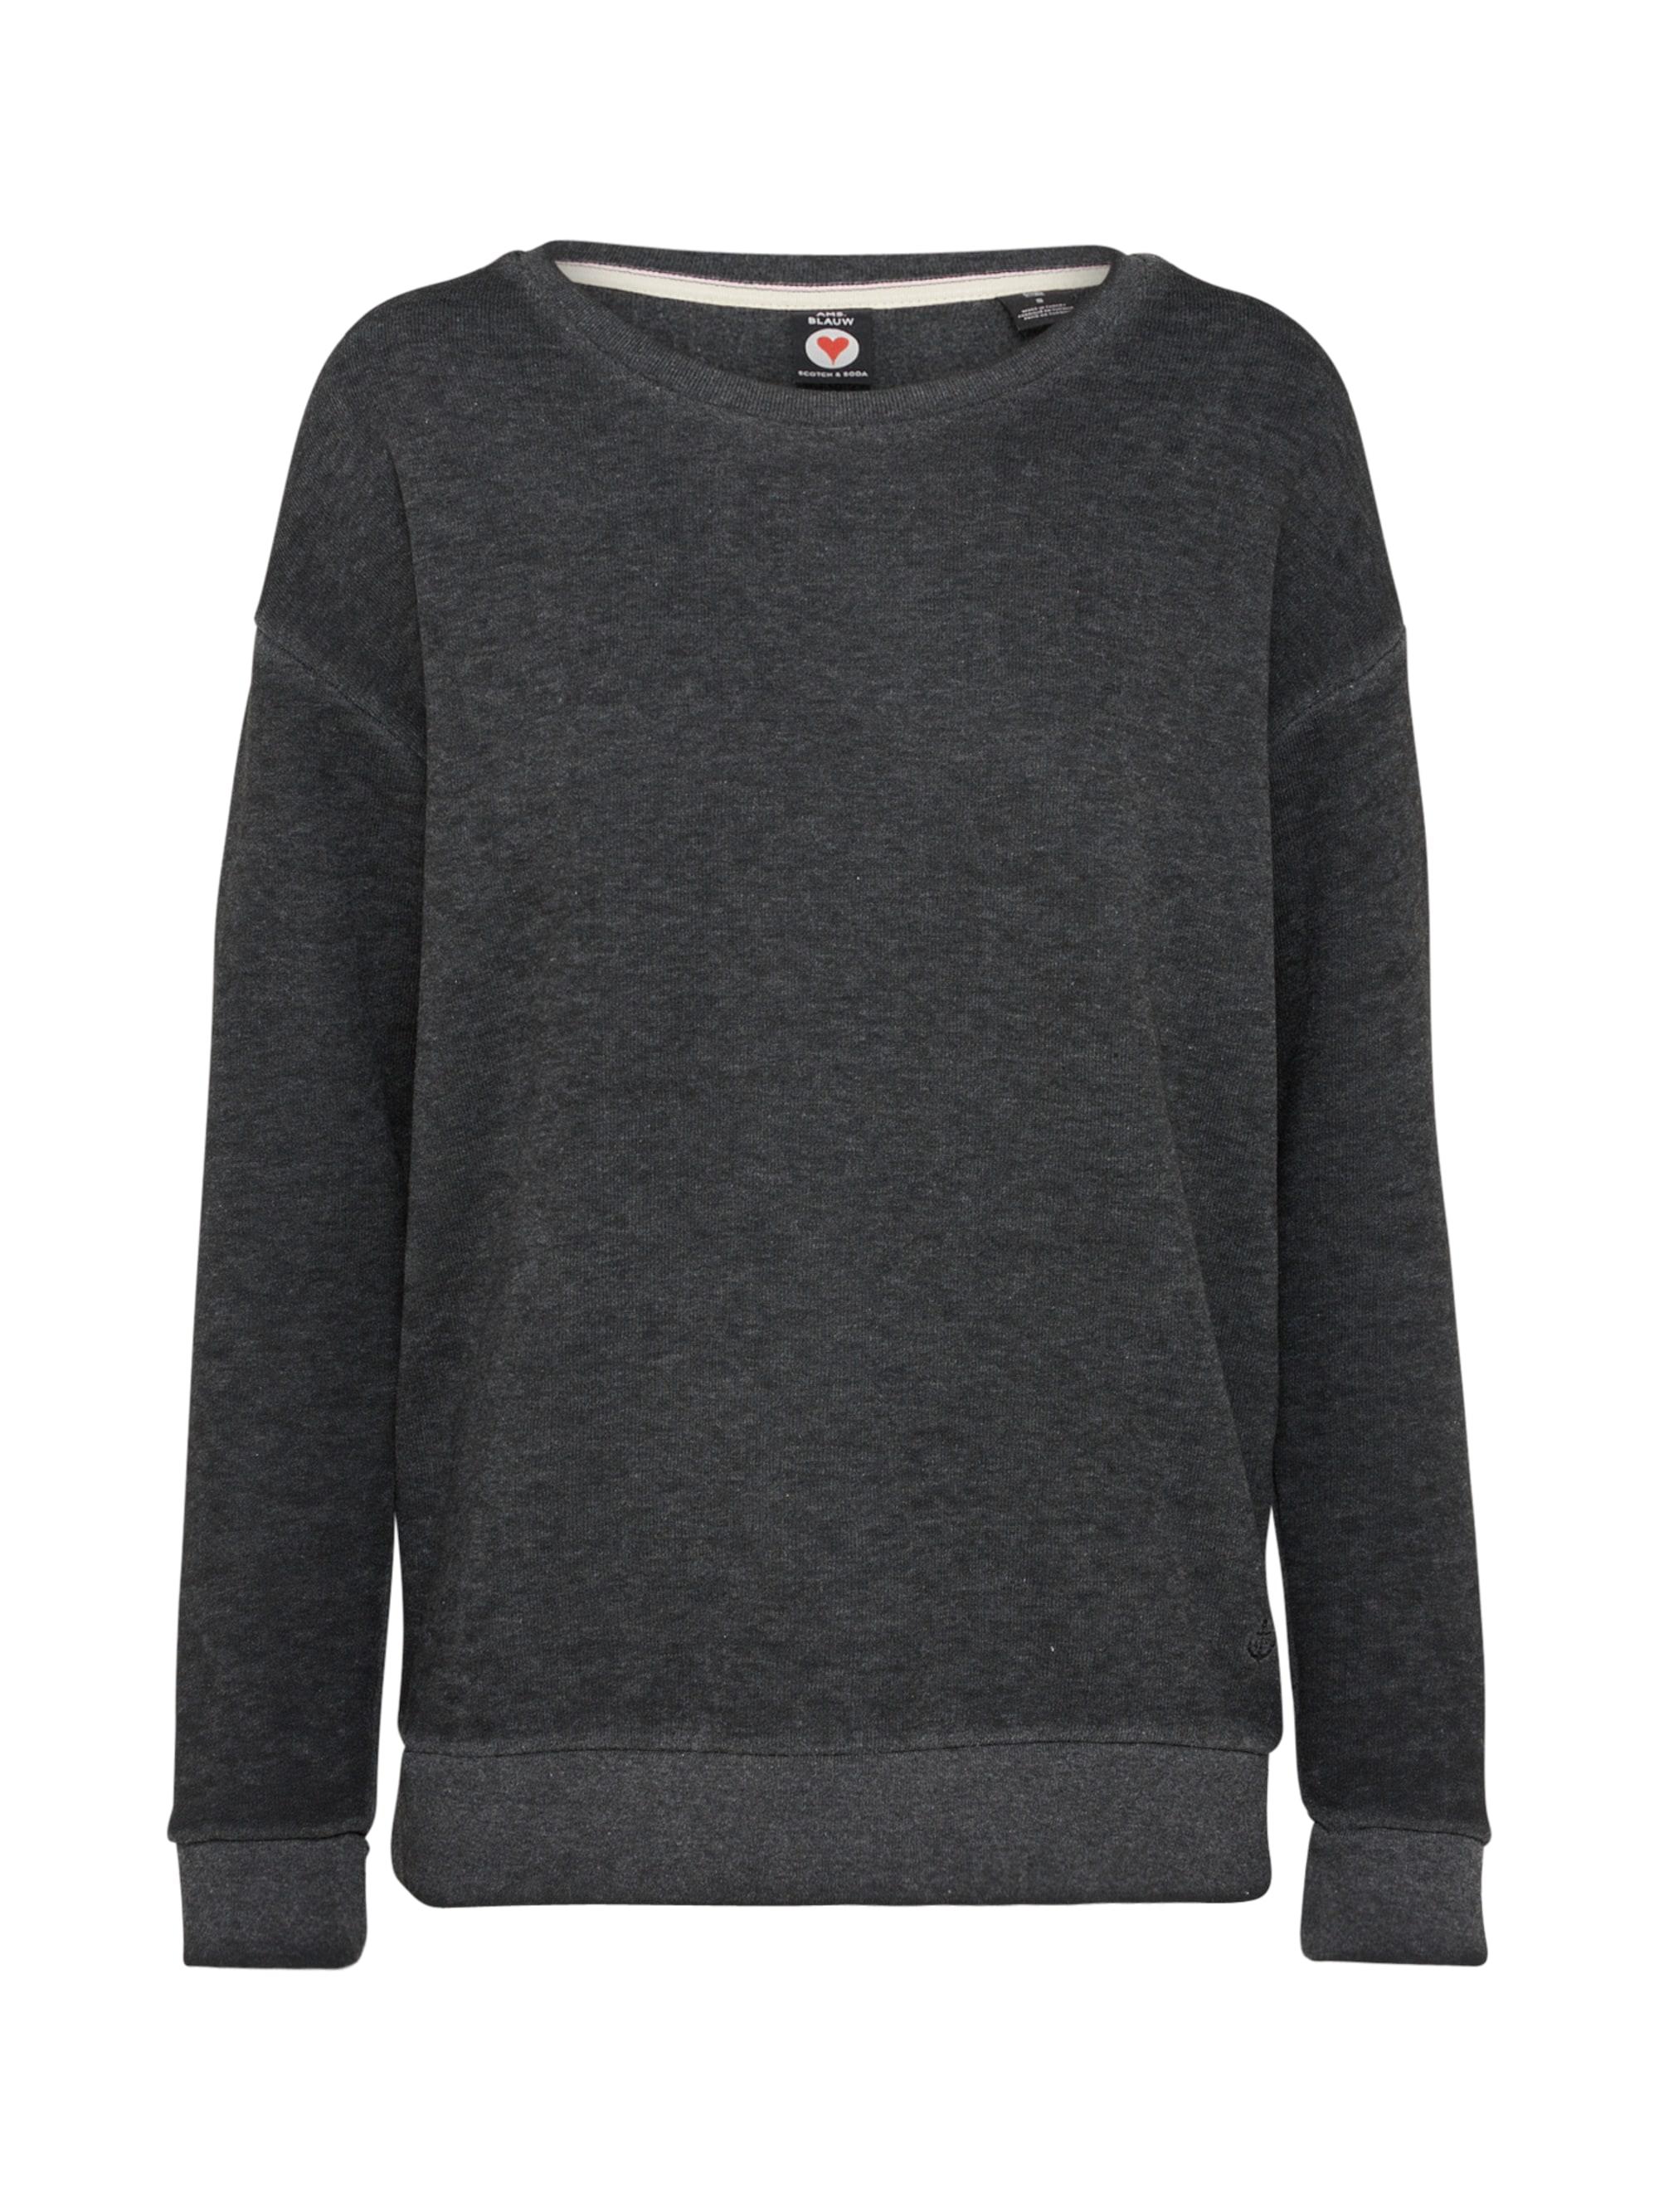 Sweatshirt ´Burn ouT´